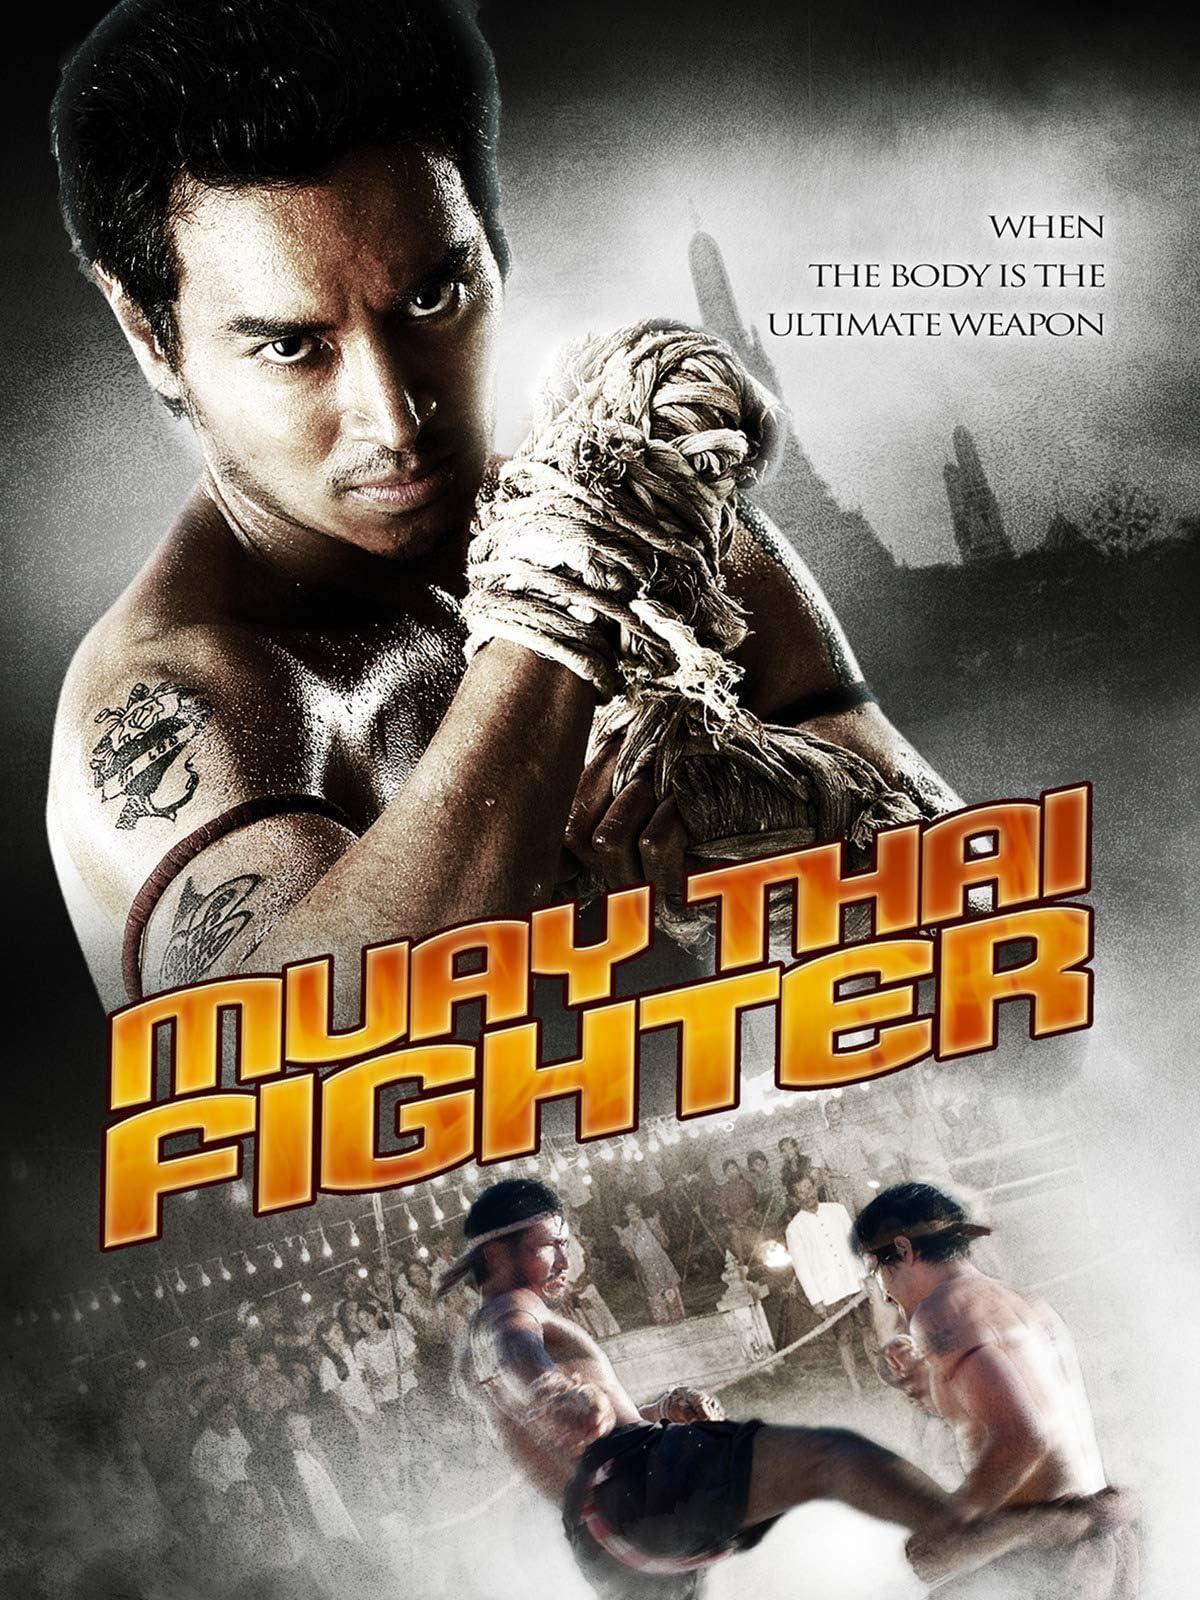 Muay Thai Fighter (2007) Hindi Dubbed